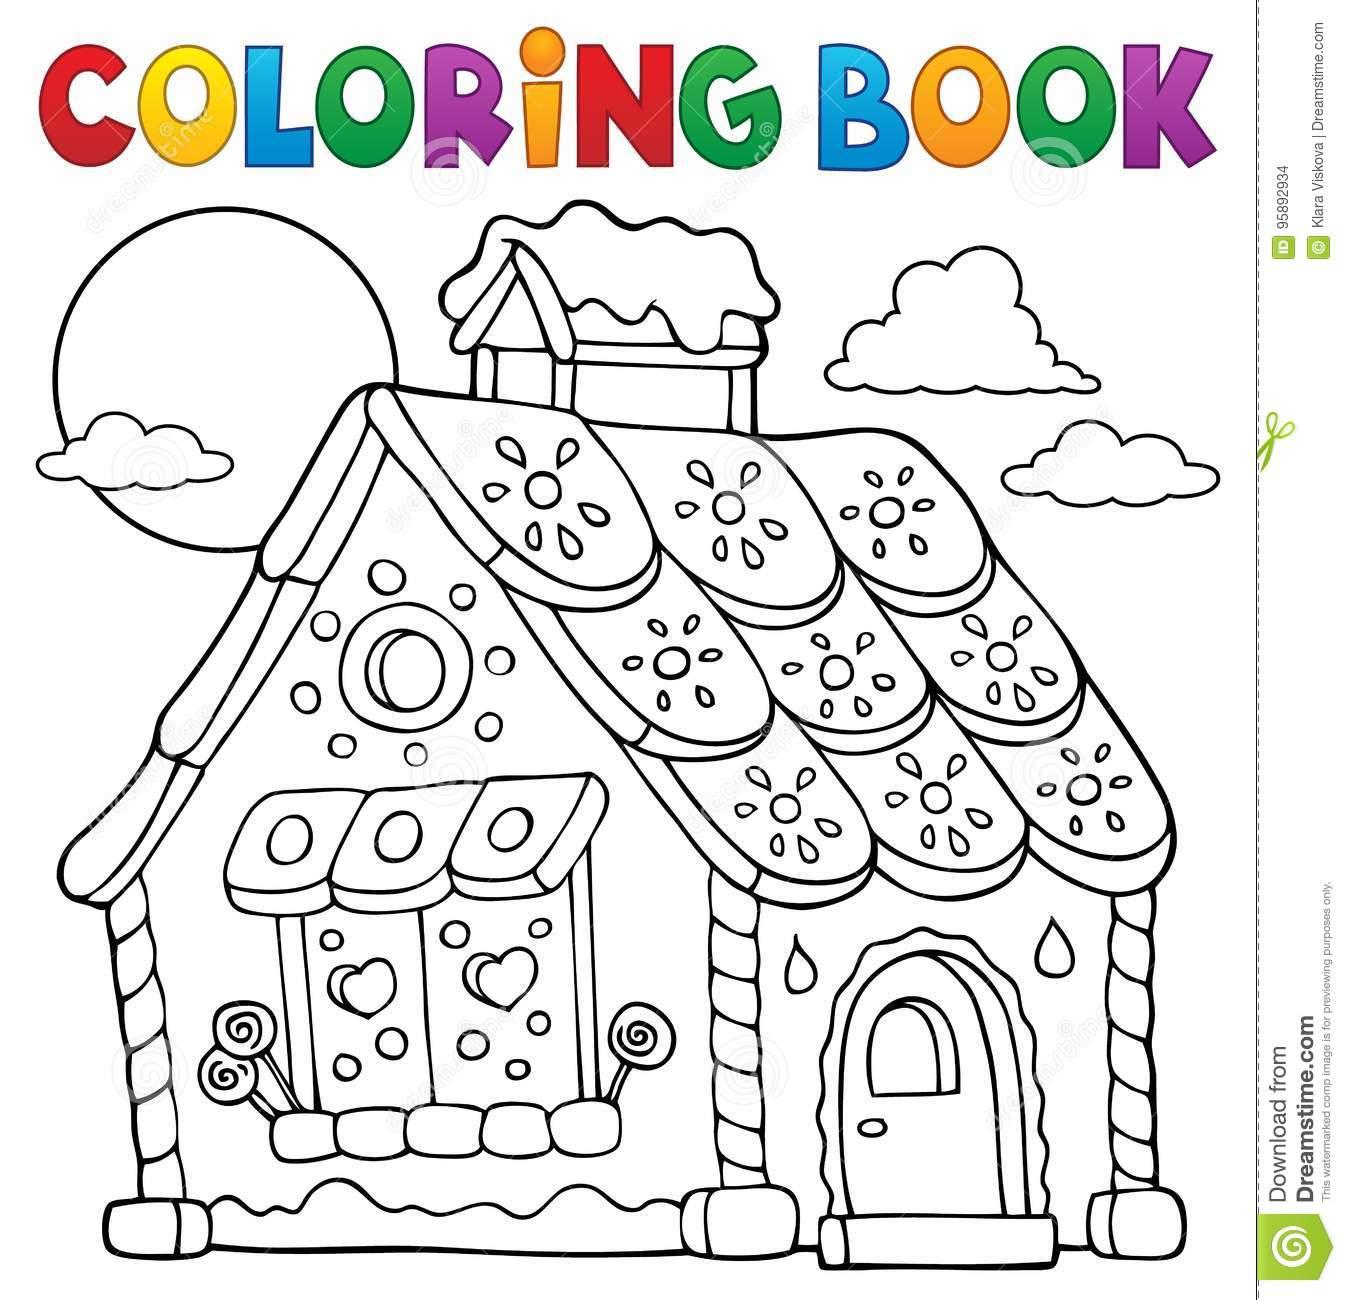 Coloring Book Gingerbread House Theme 1 Stock Vector